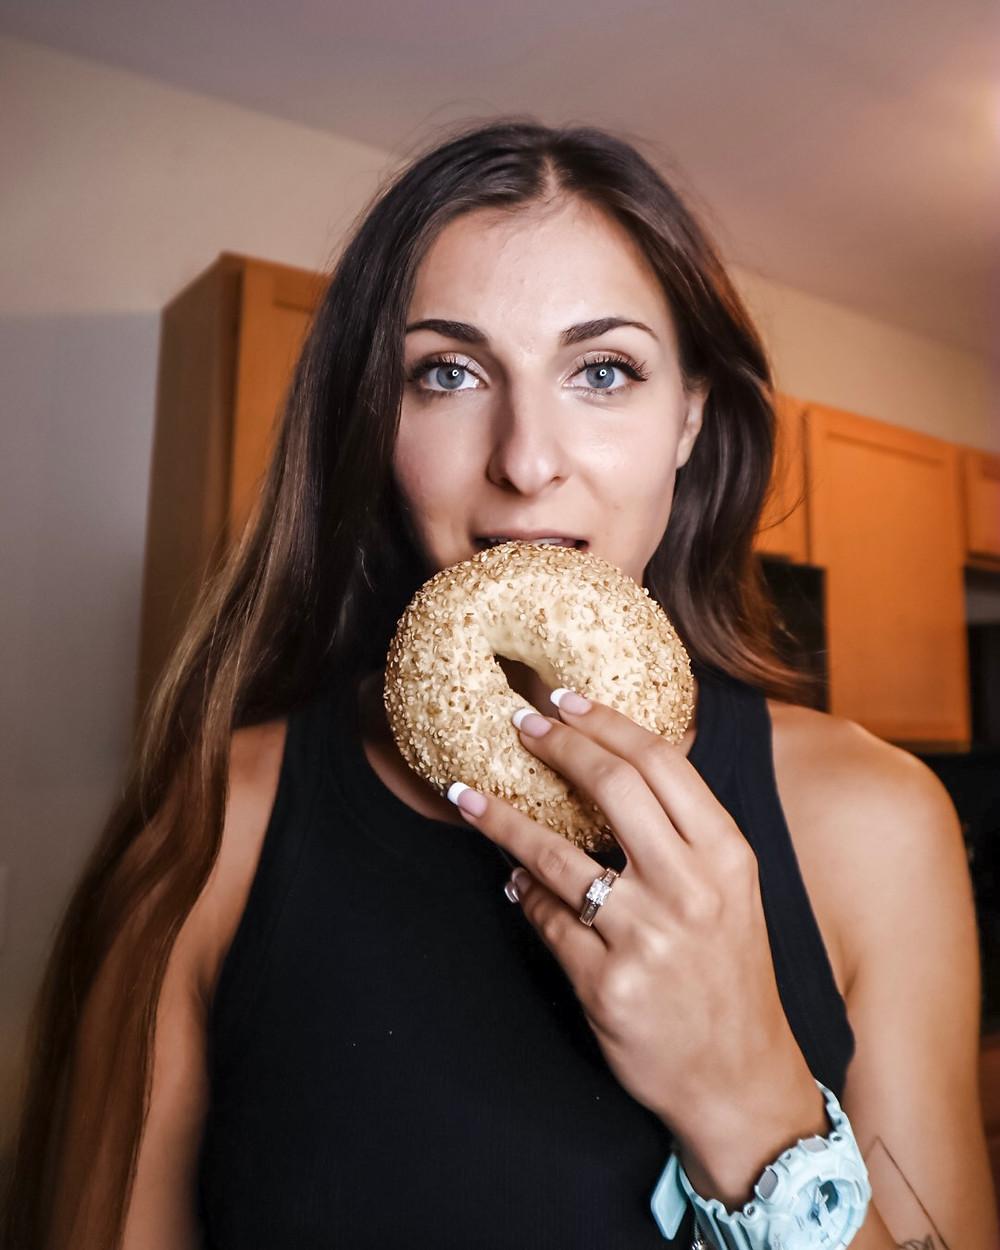 EZEKIEL BREAD, Spelt bread, healthy bread choices, what bread to eat, personal trainer Myrtle Beach